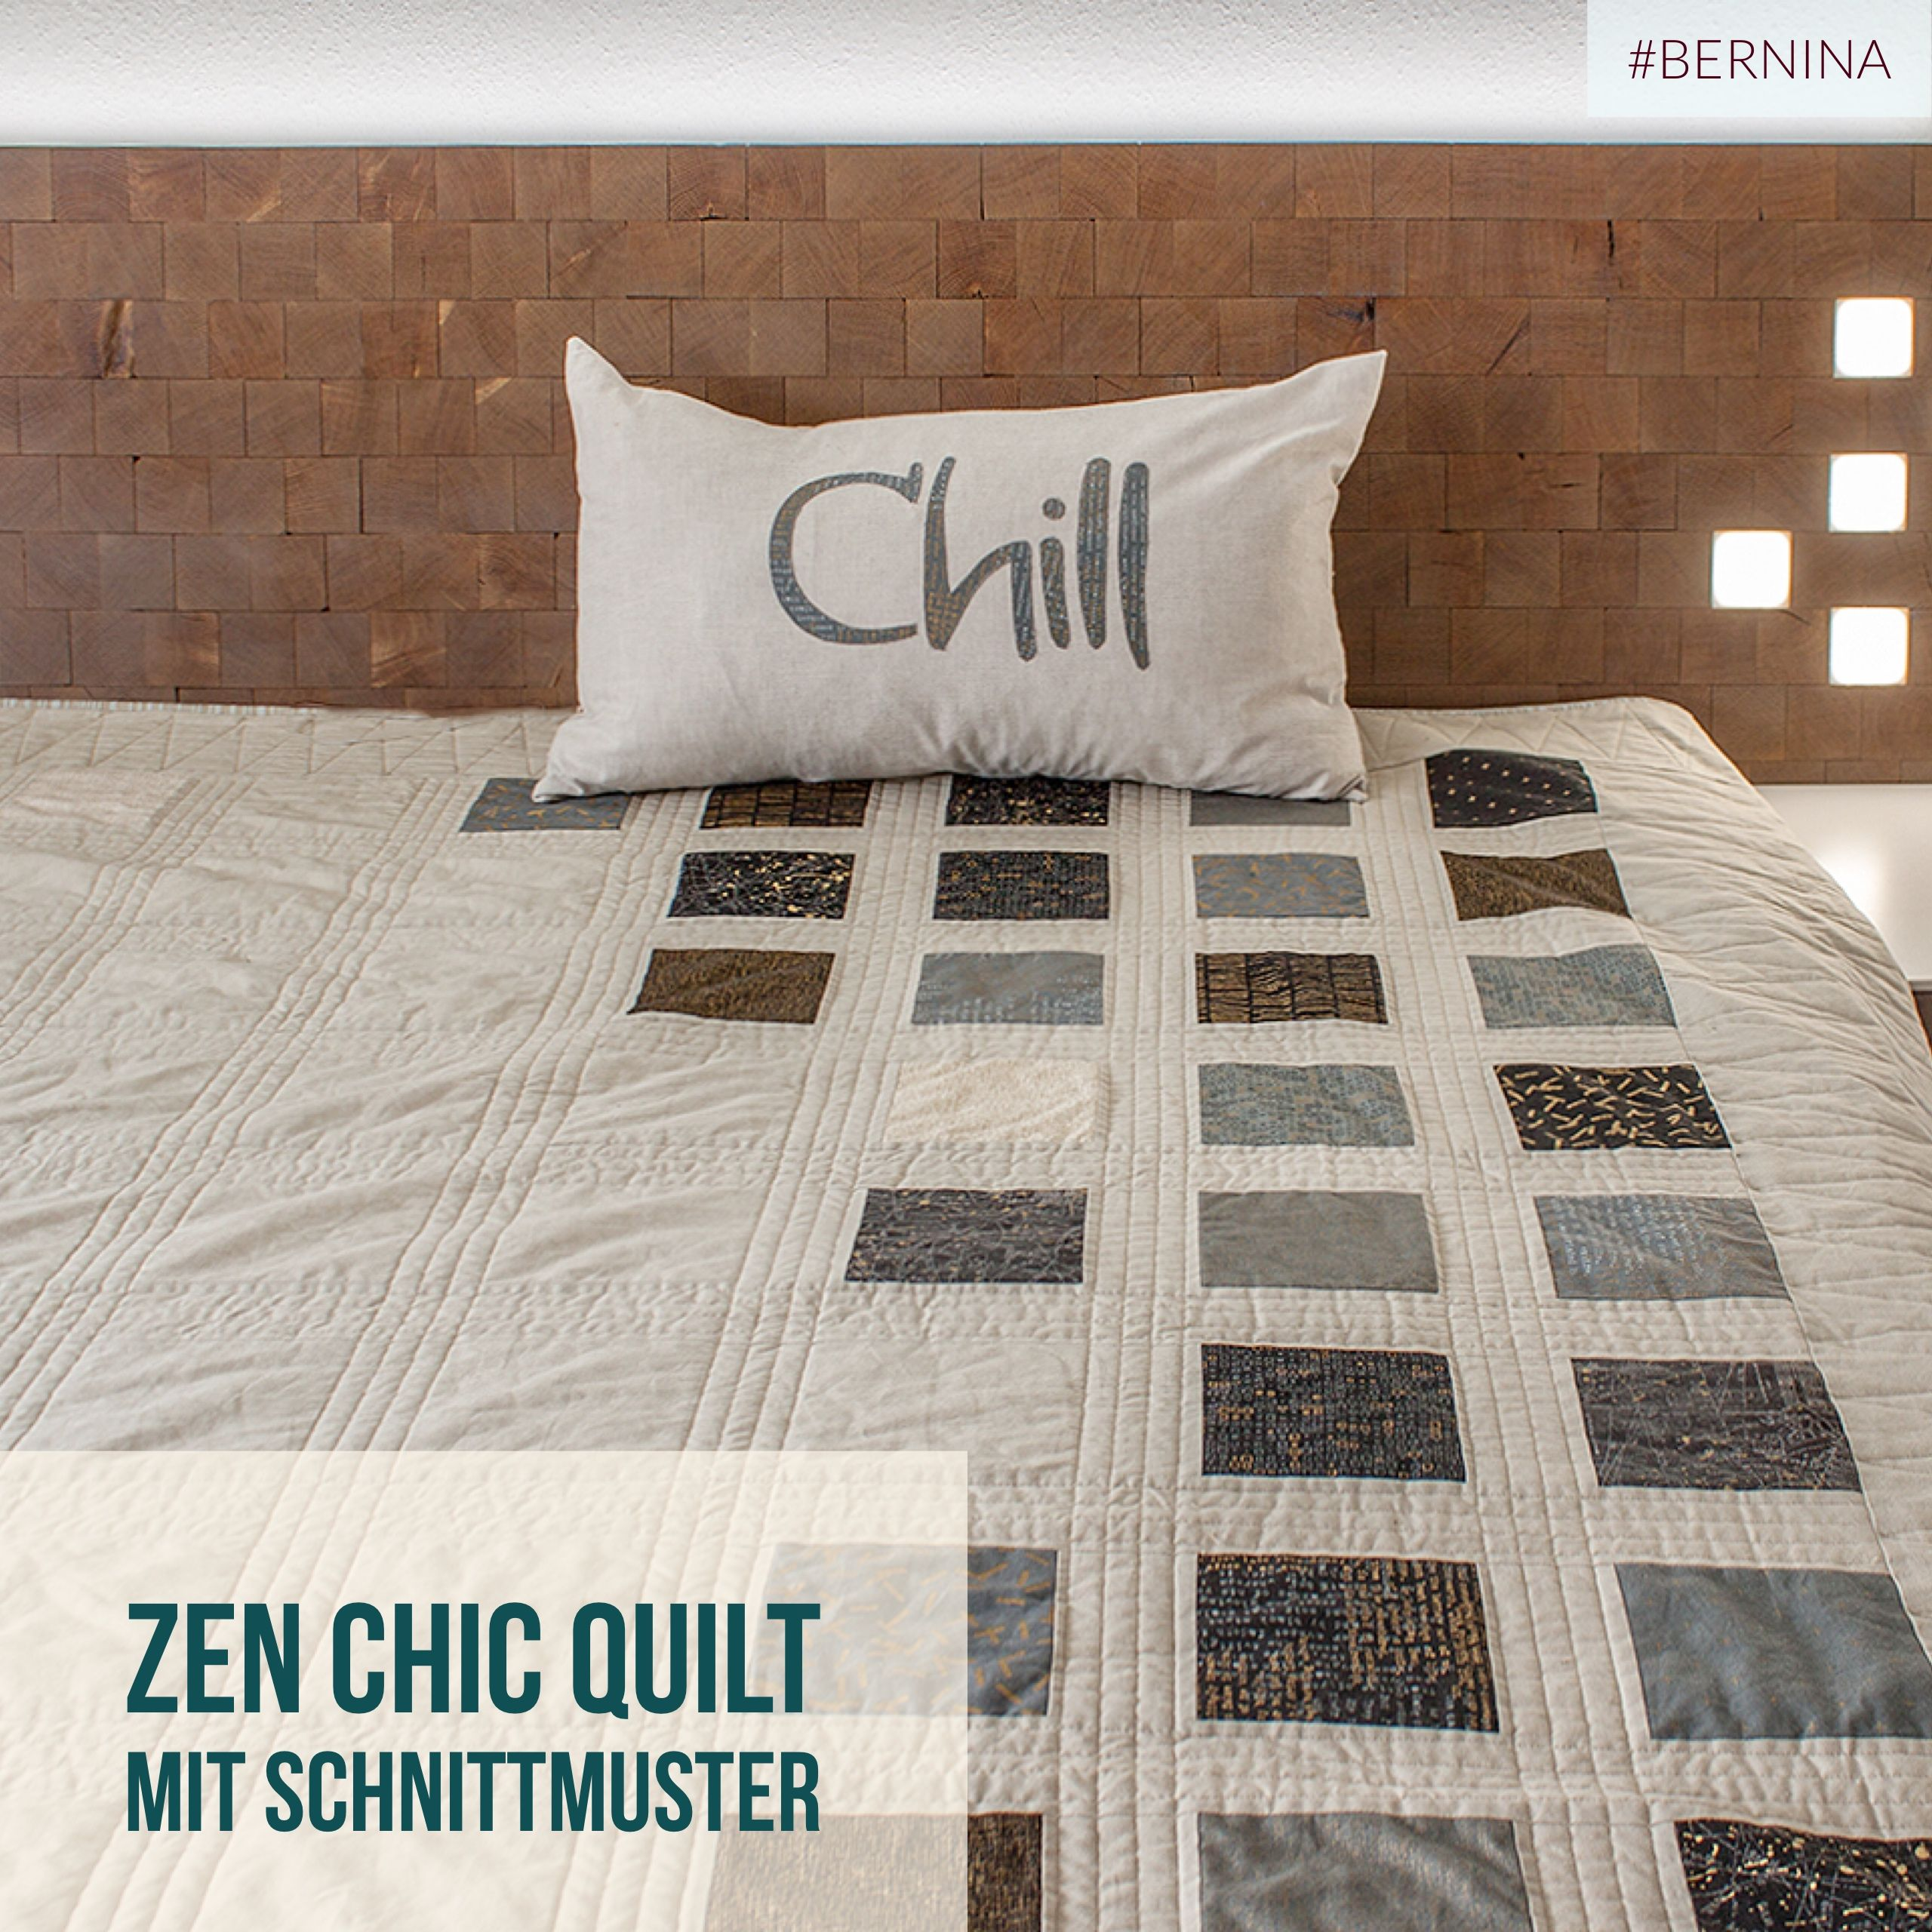 zen chic quilt color chart zen chic quilts pinterest n hen quilten und n hanleitung. Black Bedroom Furniture Sets. Home Design Ideas